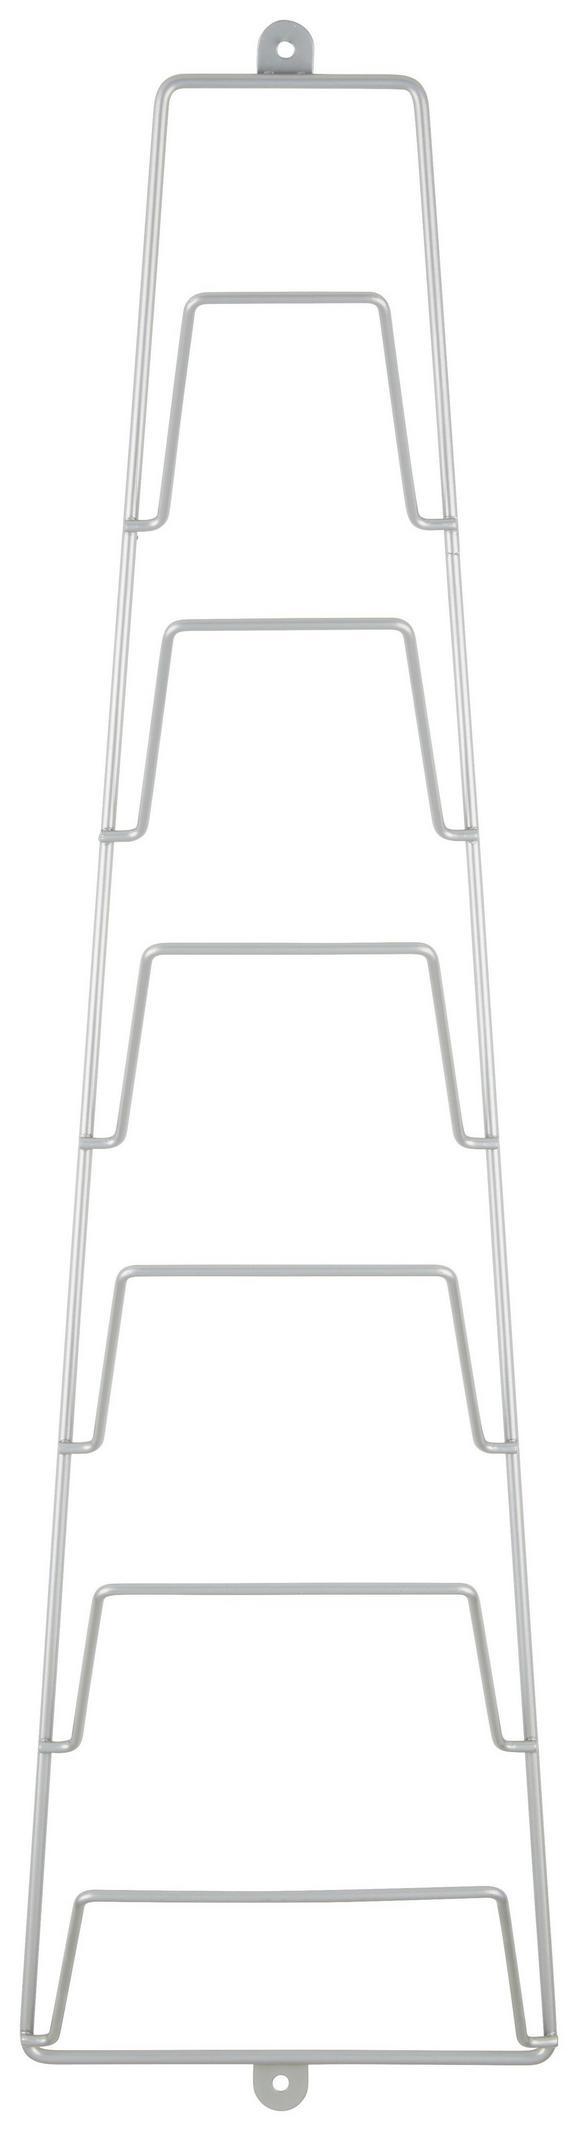 Stojalo Za Časopise Praktiker - aluminij, kovina (18/65/18cm) - Mömax modern living